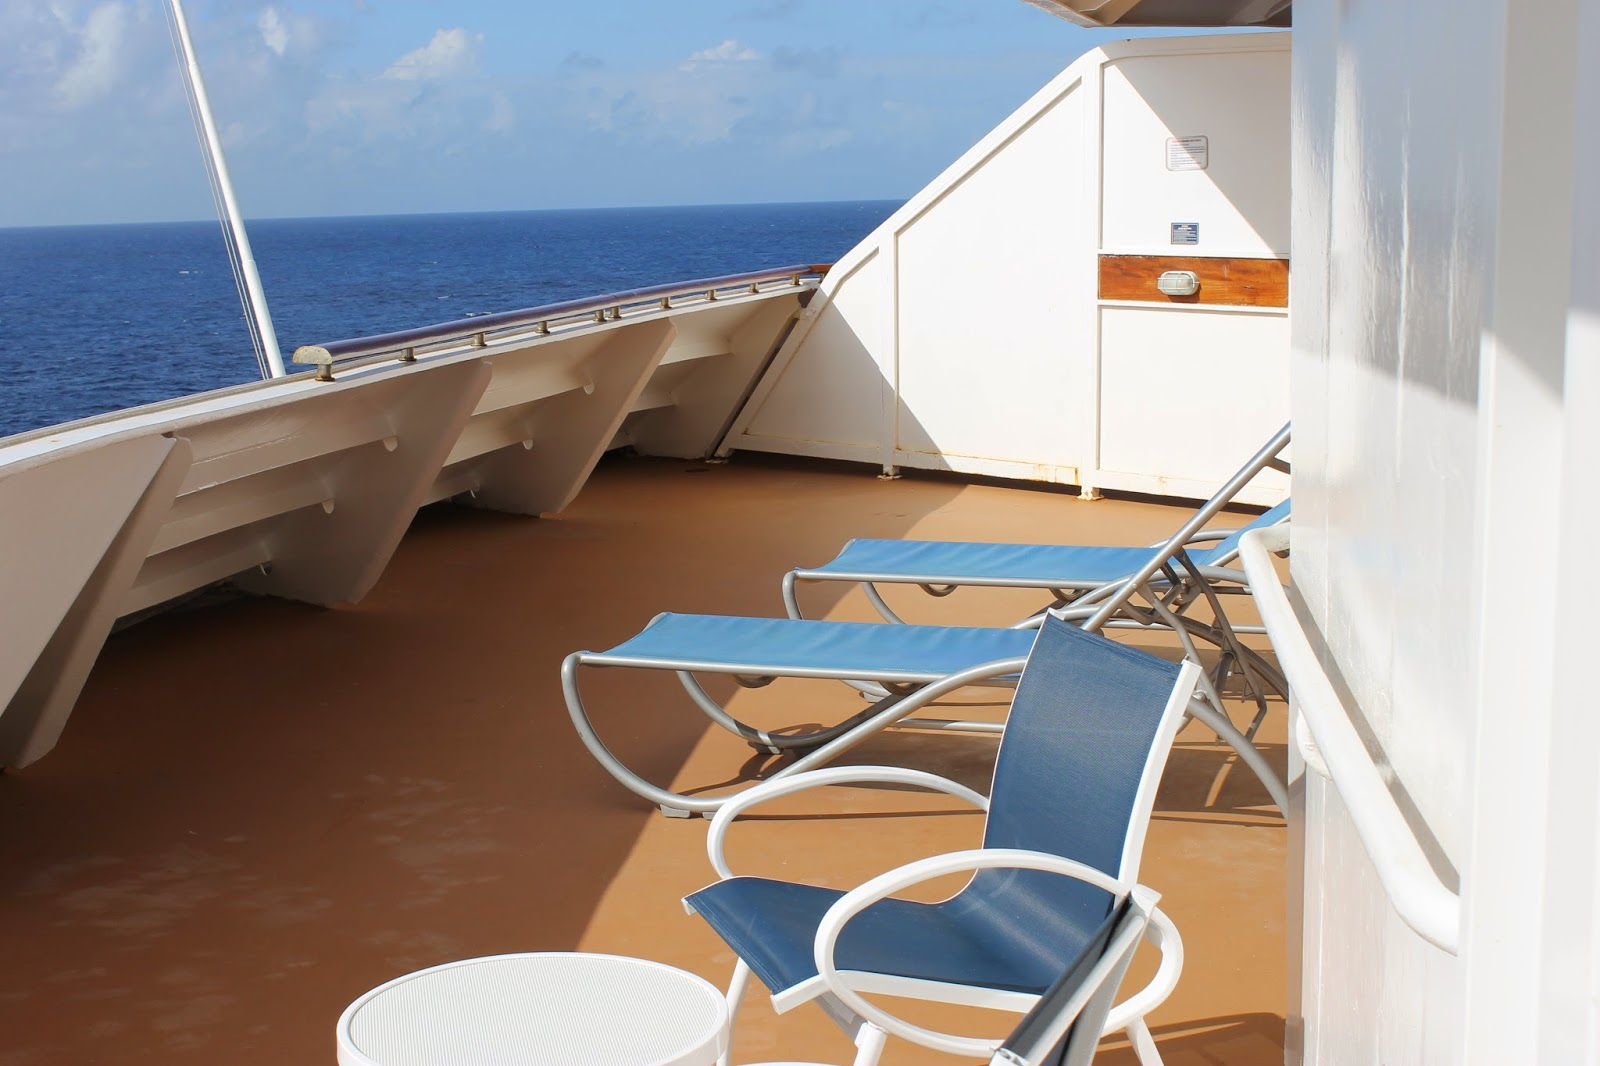 Disney Devoted Disney Cruise Line Handicap Accessible